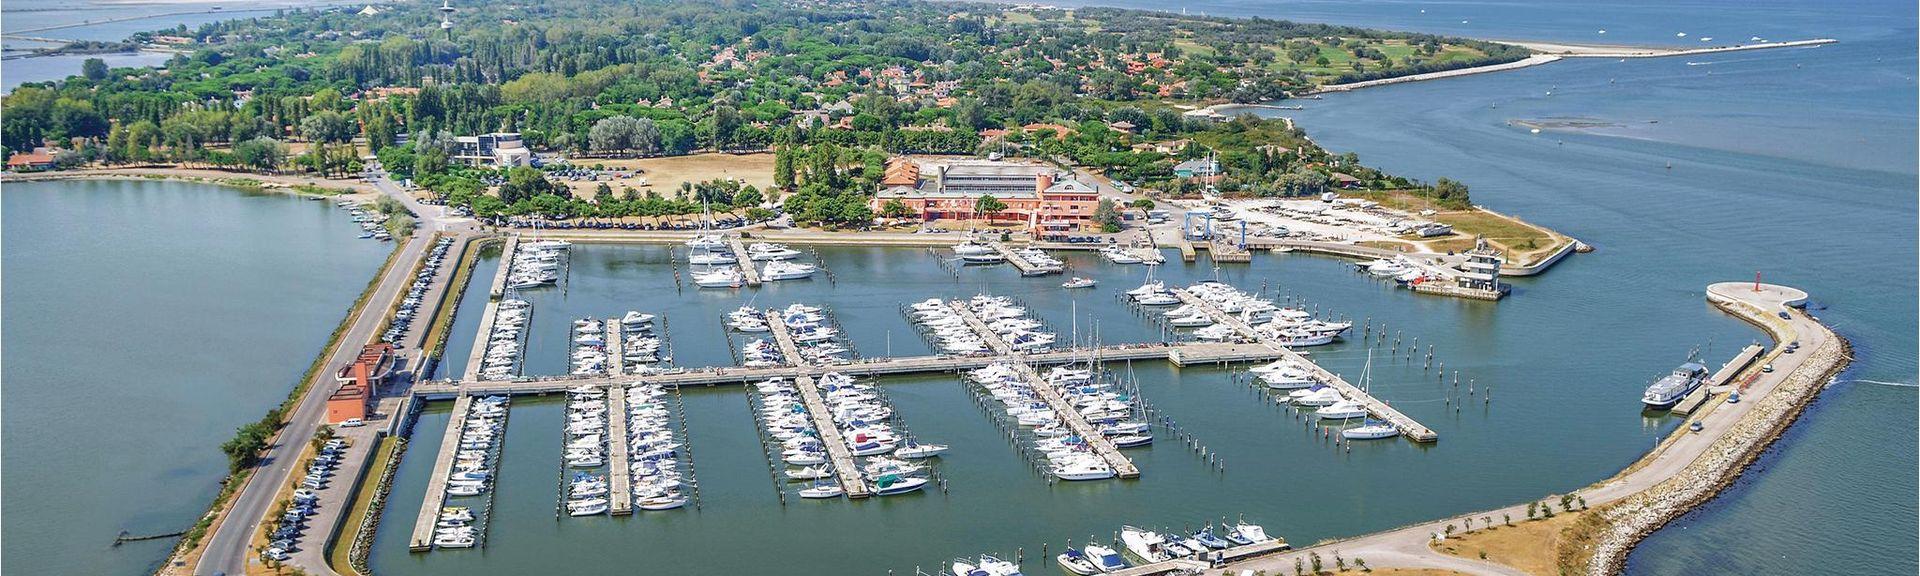 Sottomarina, Chioggia, Vêneto, Itália